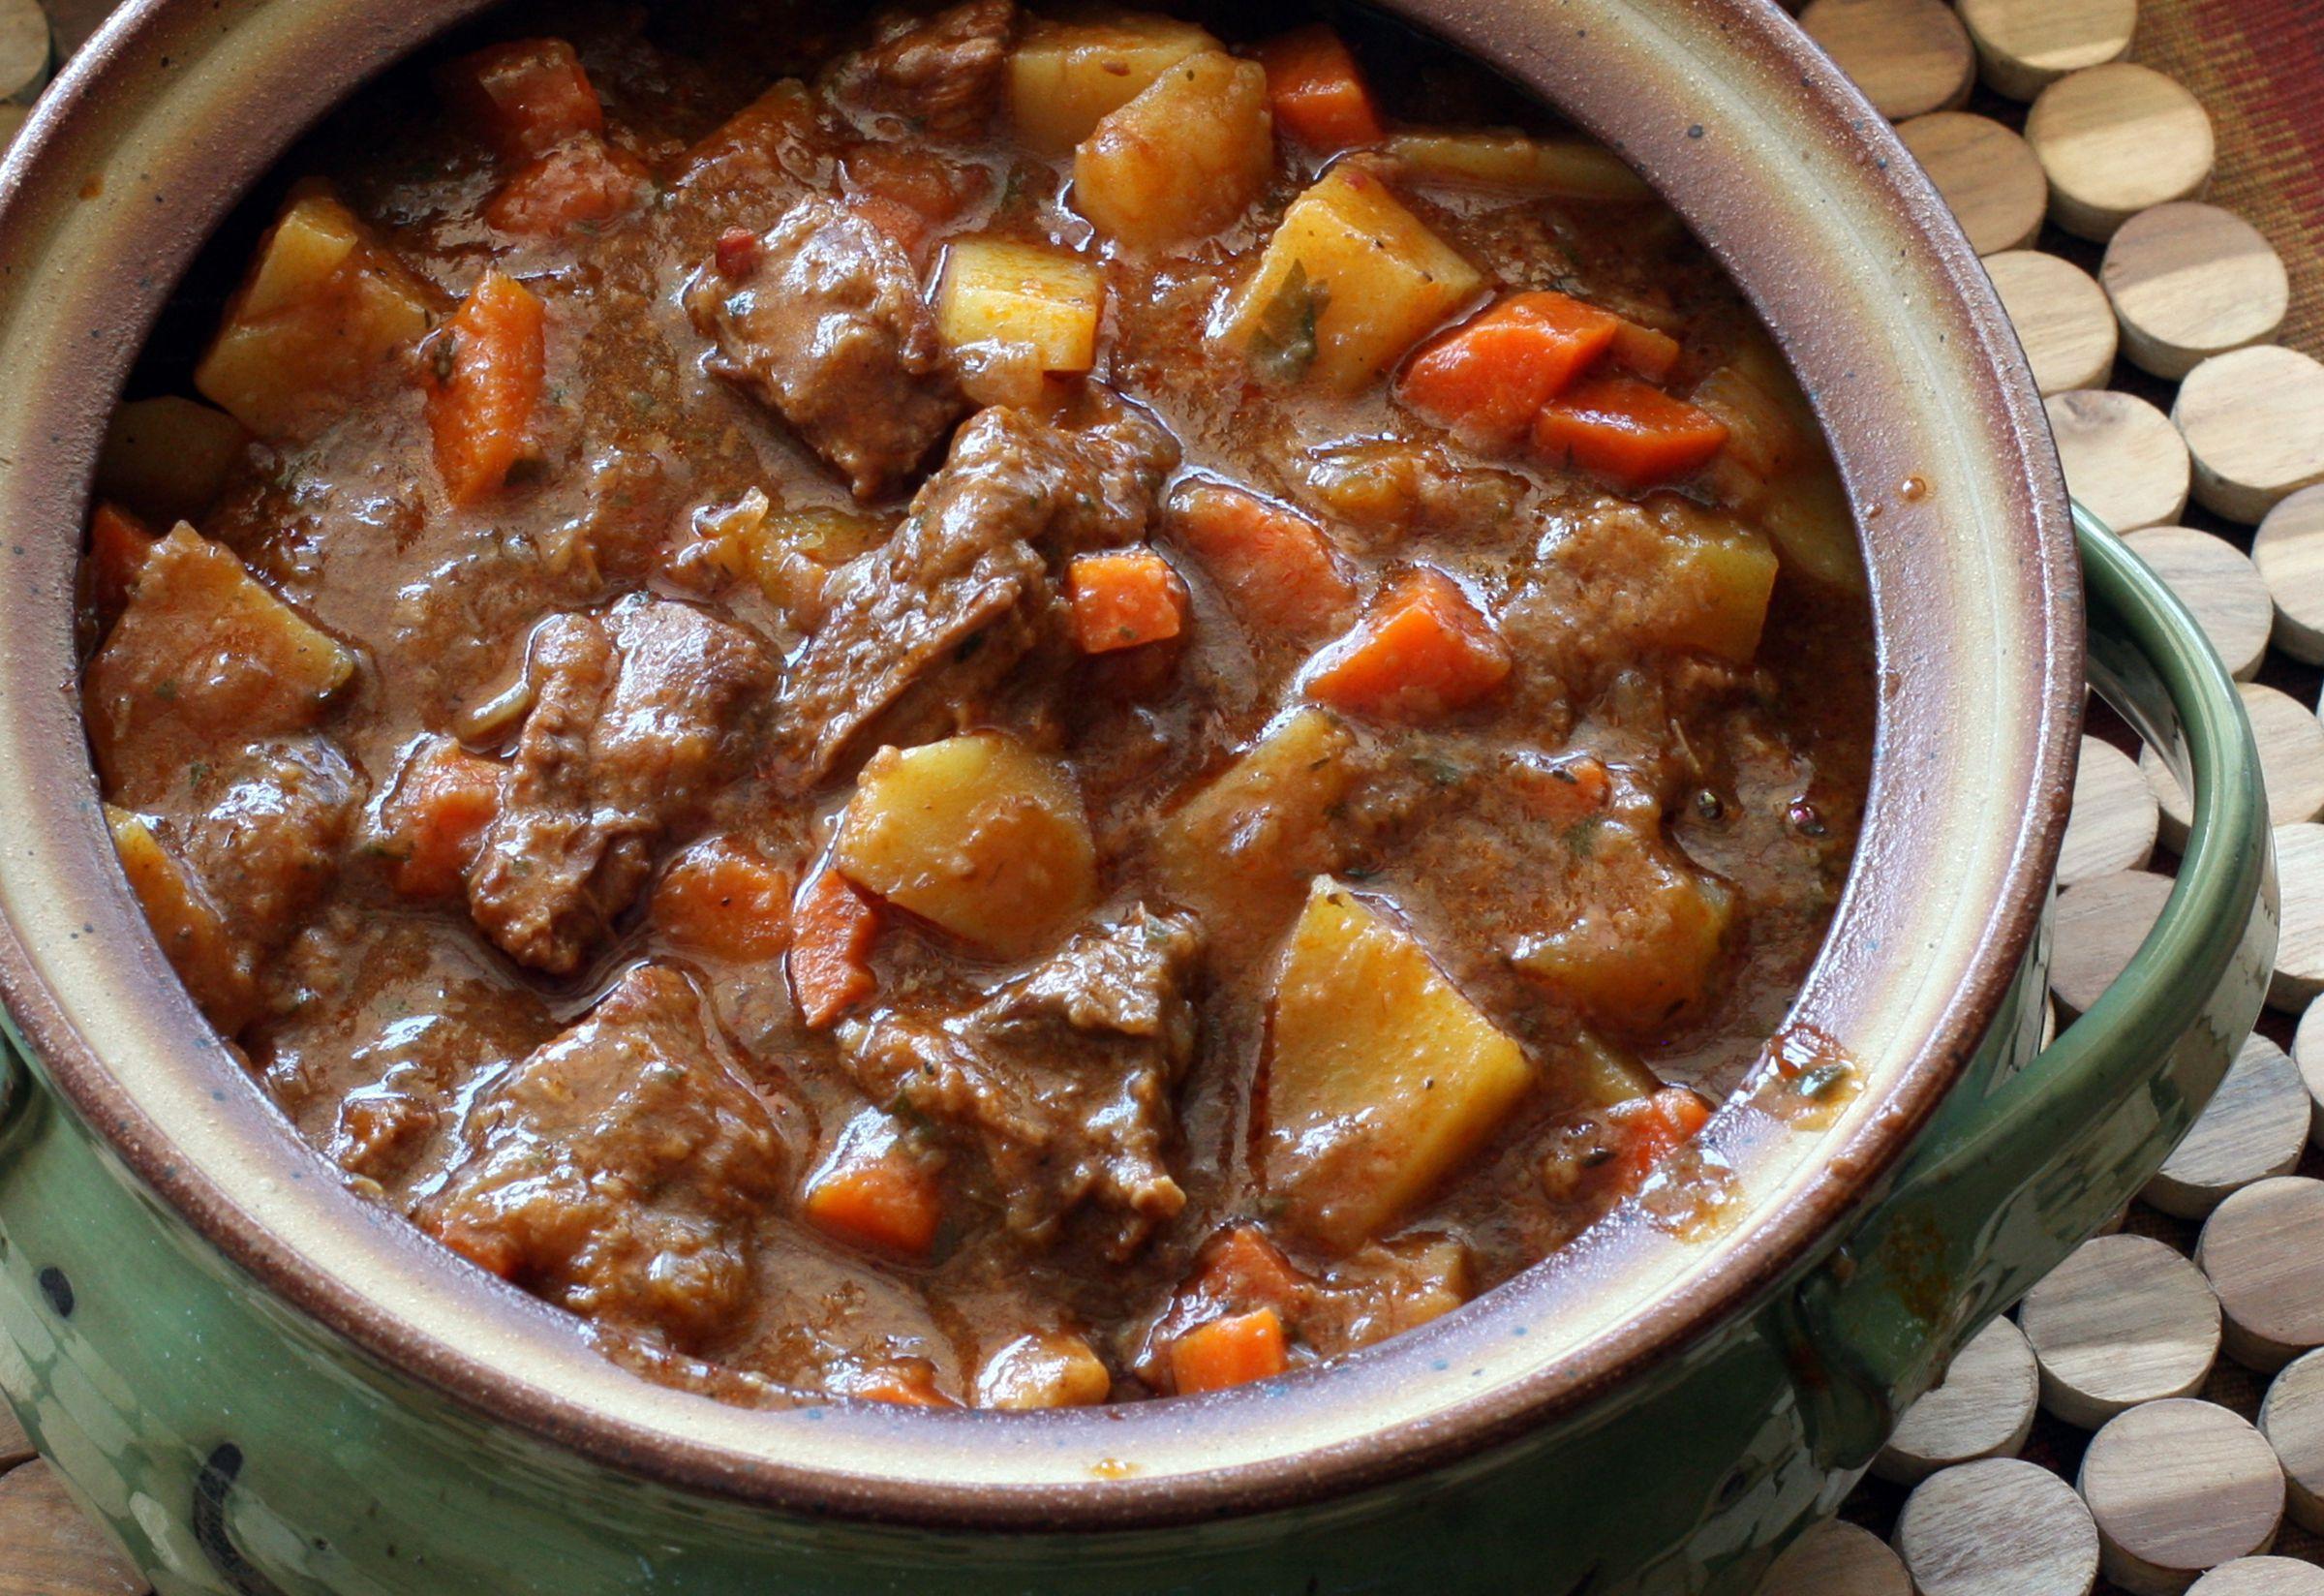 Betty crocker old fashioned beef stew 68